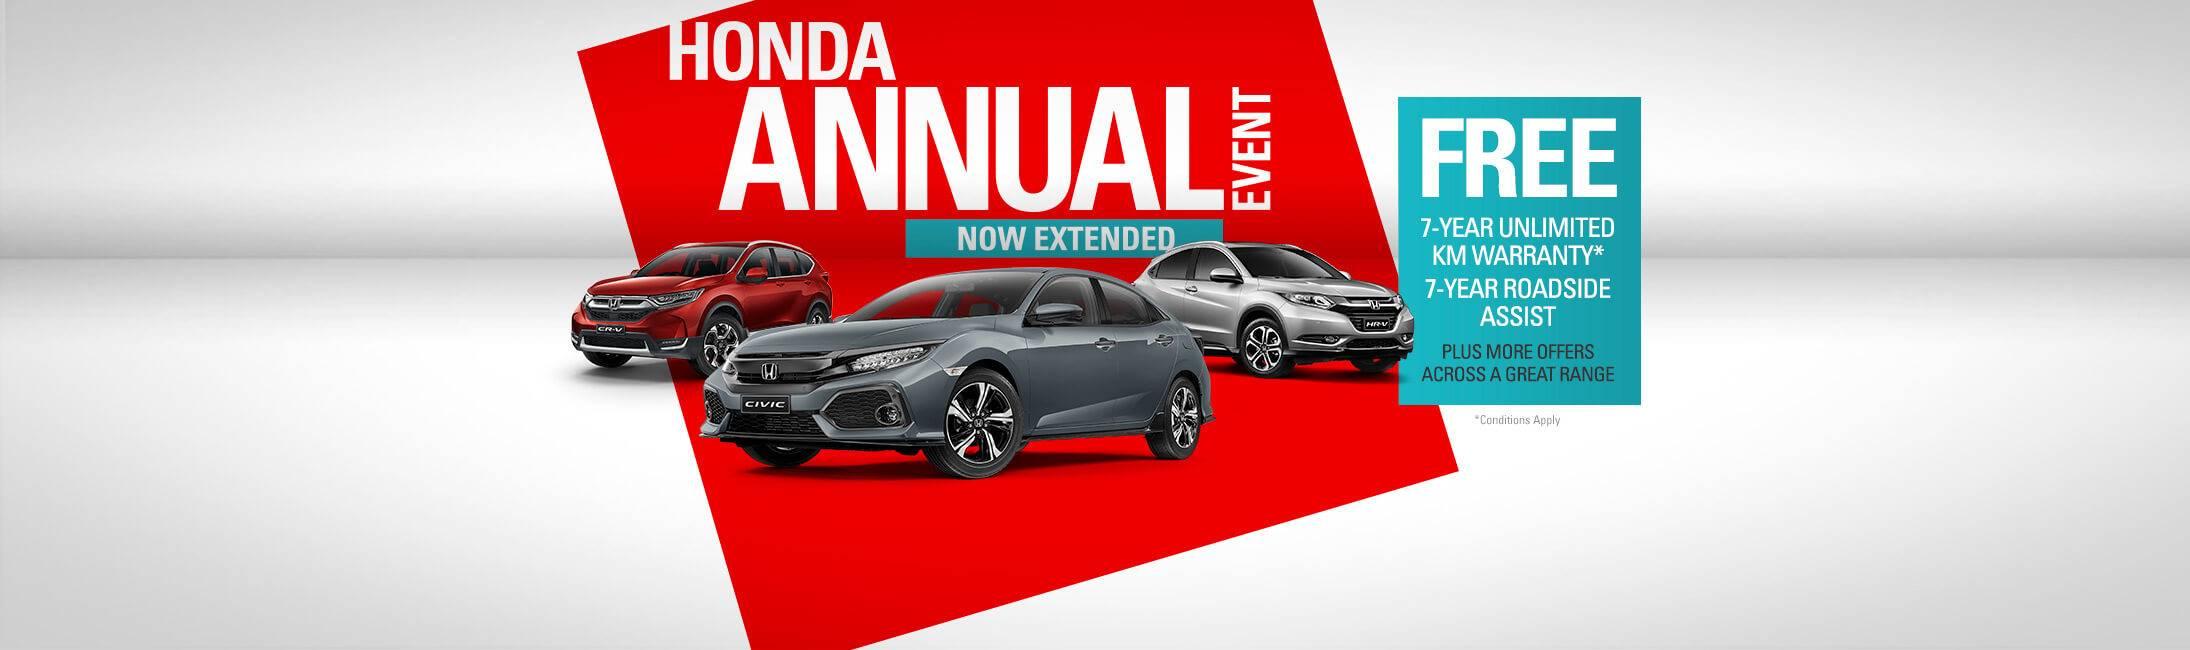 Honda Offers